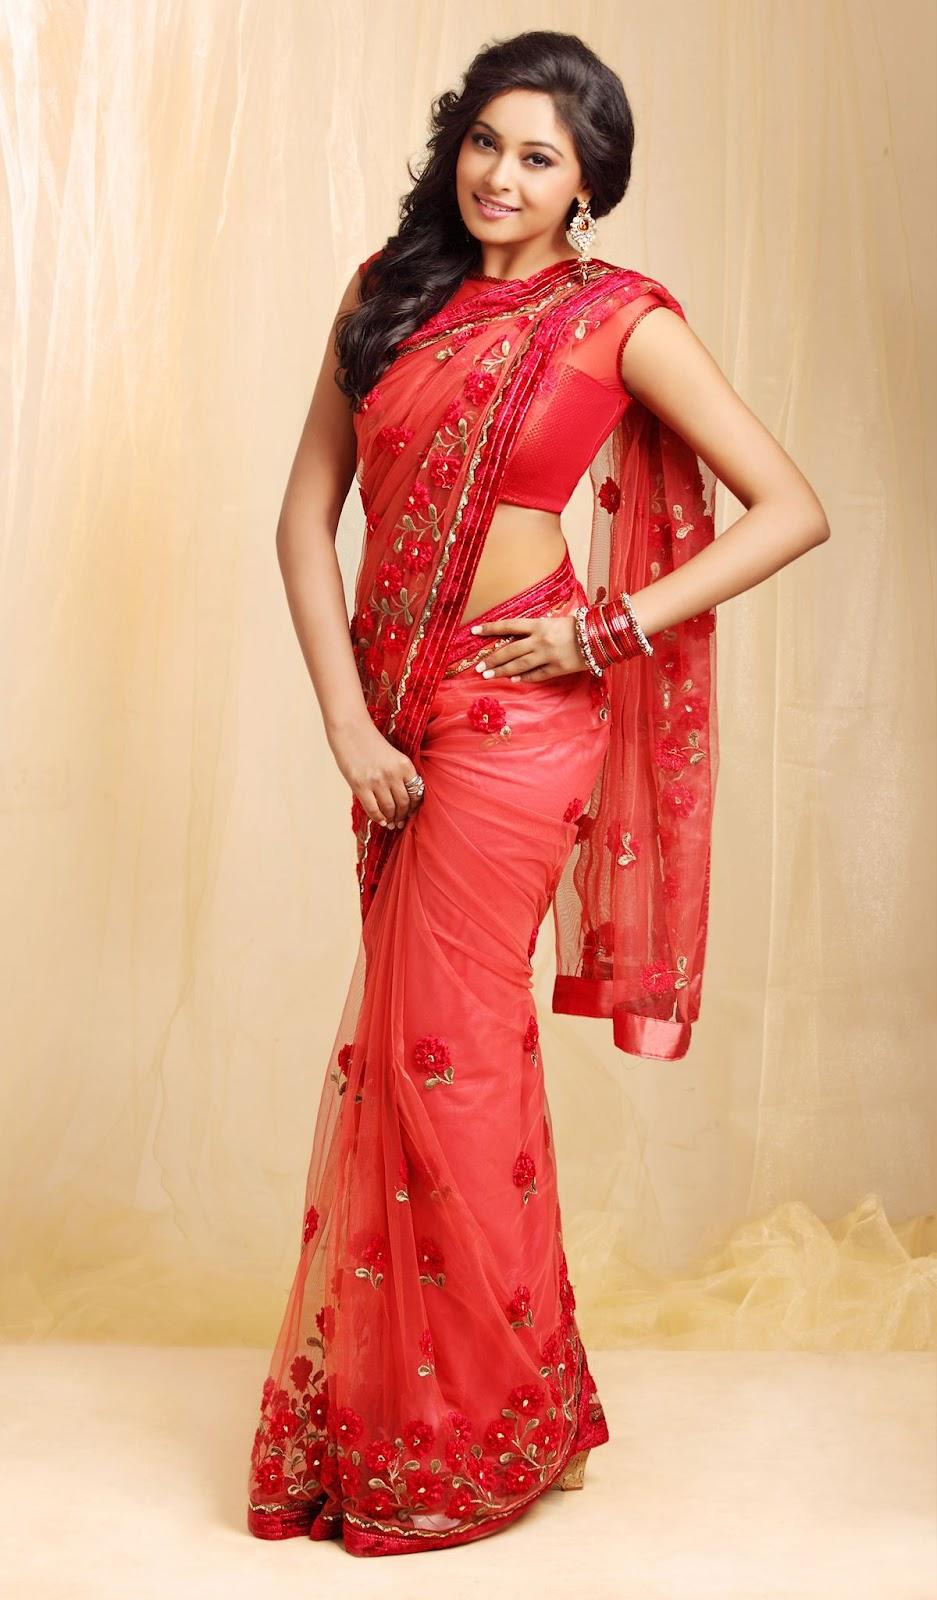 Sexy Film Sexy Film Hindi Mai